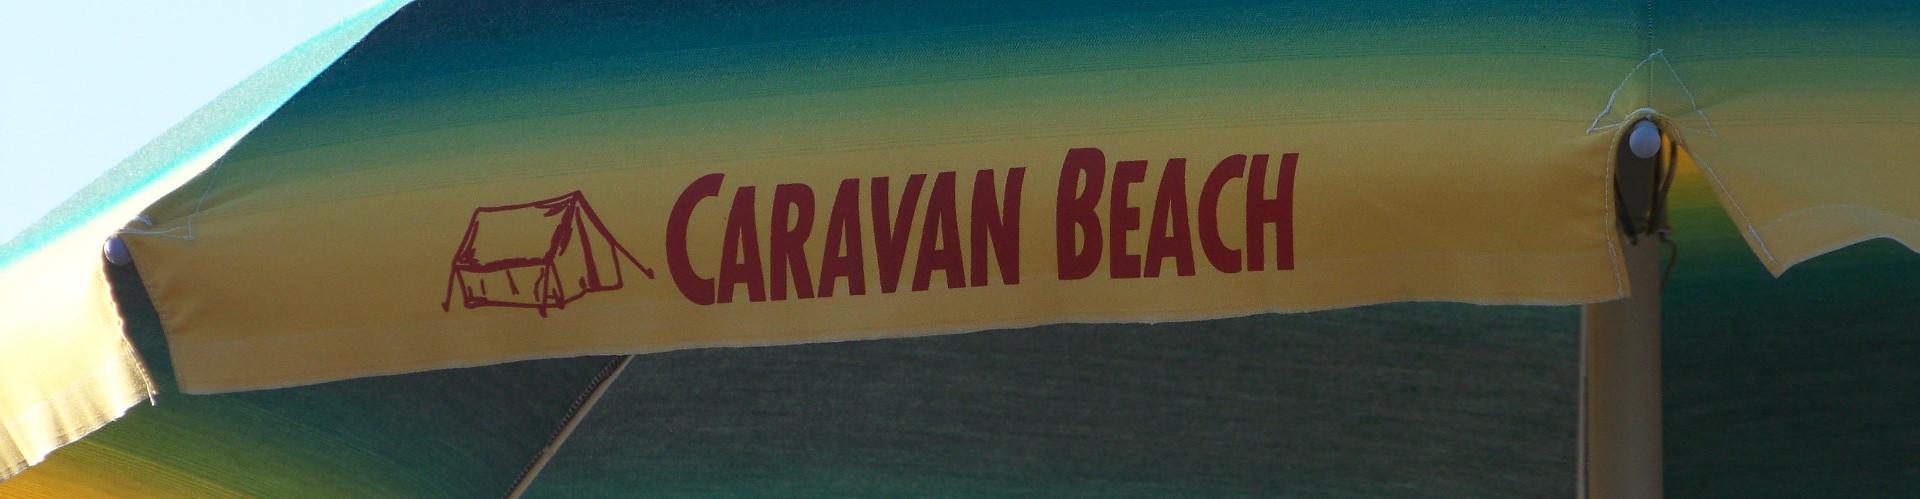 Caravan Beach